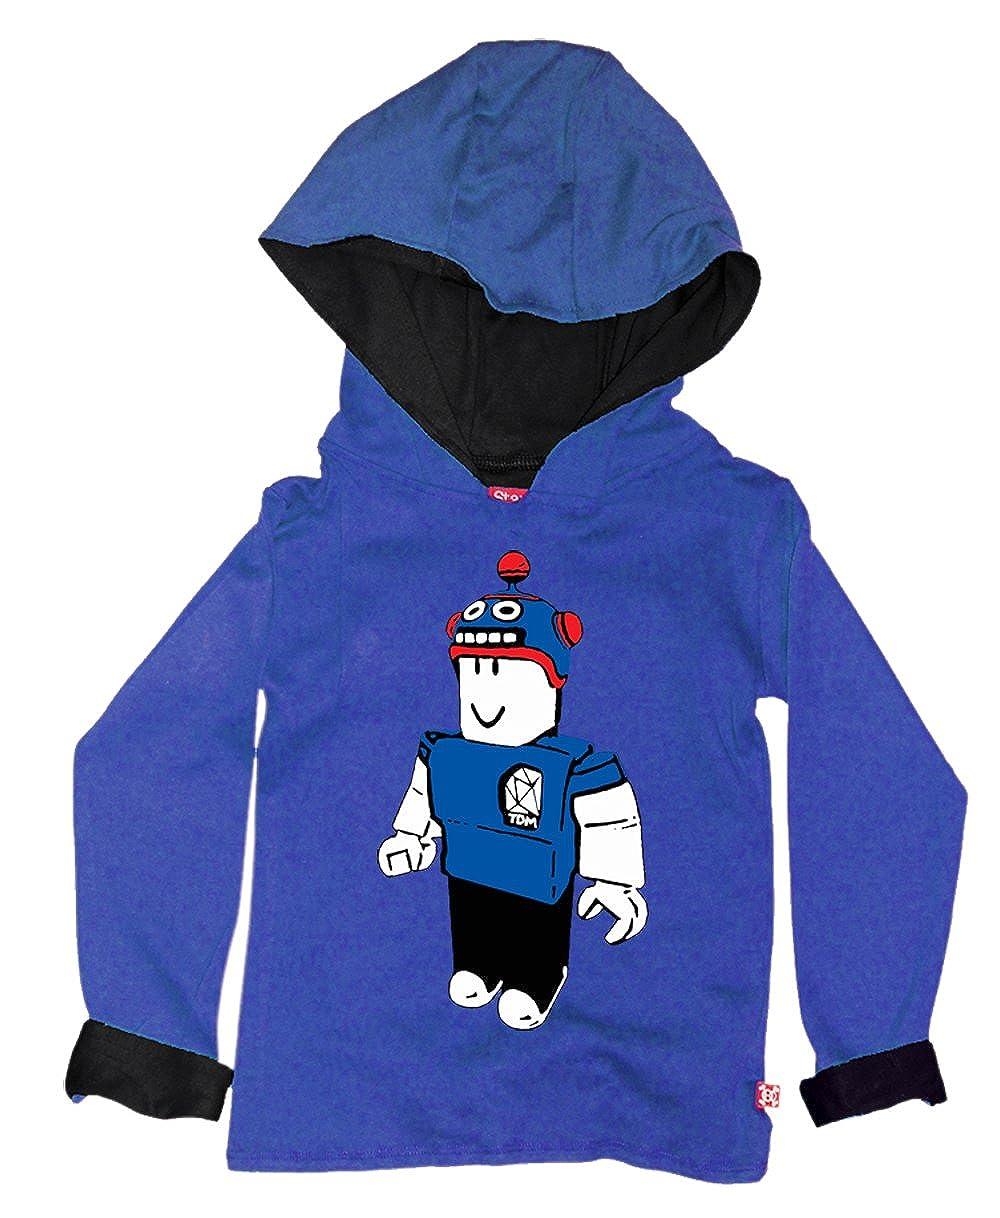 Black Stardust Ethical Kids Childrens Dan TDM Diamond Minecart Roblox Hoody Hoodies & Sweatshirts Boys' Clothing